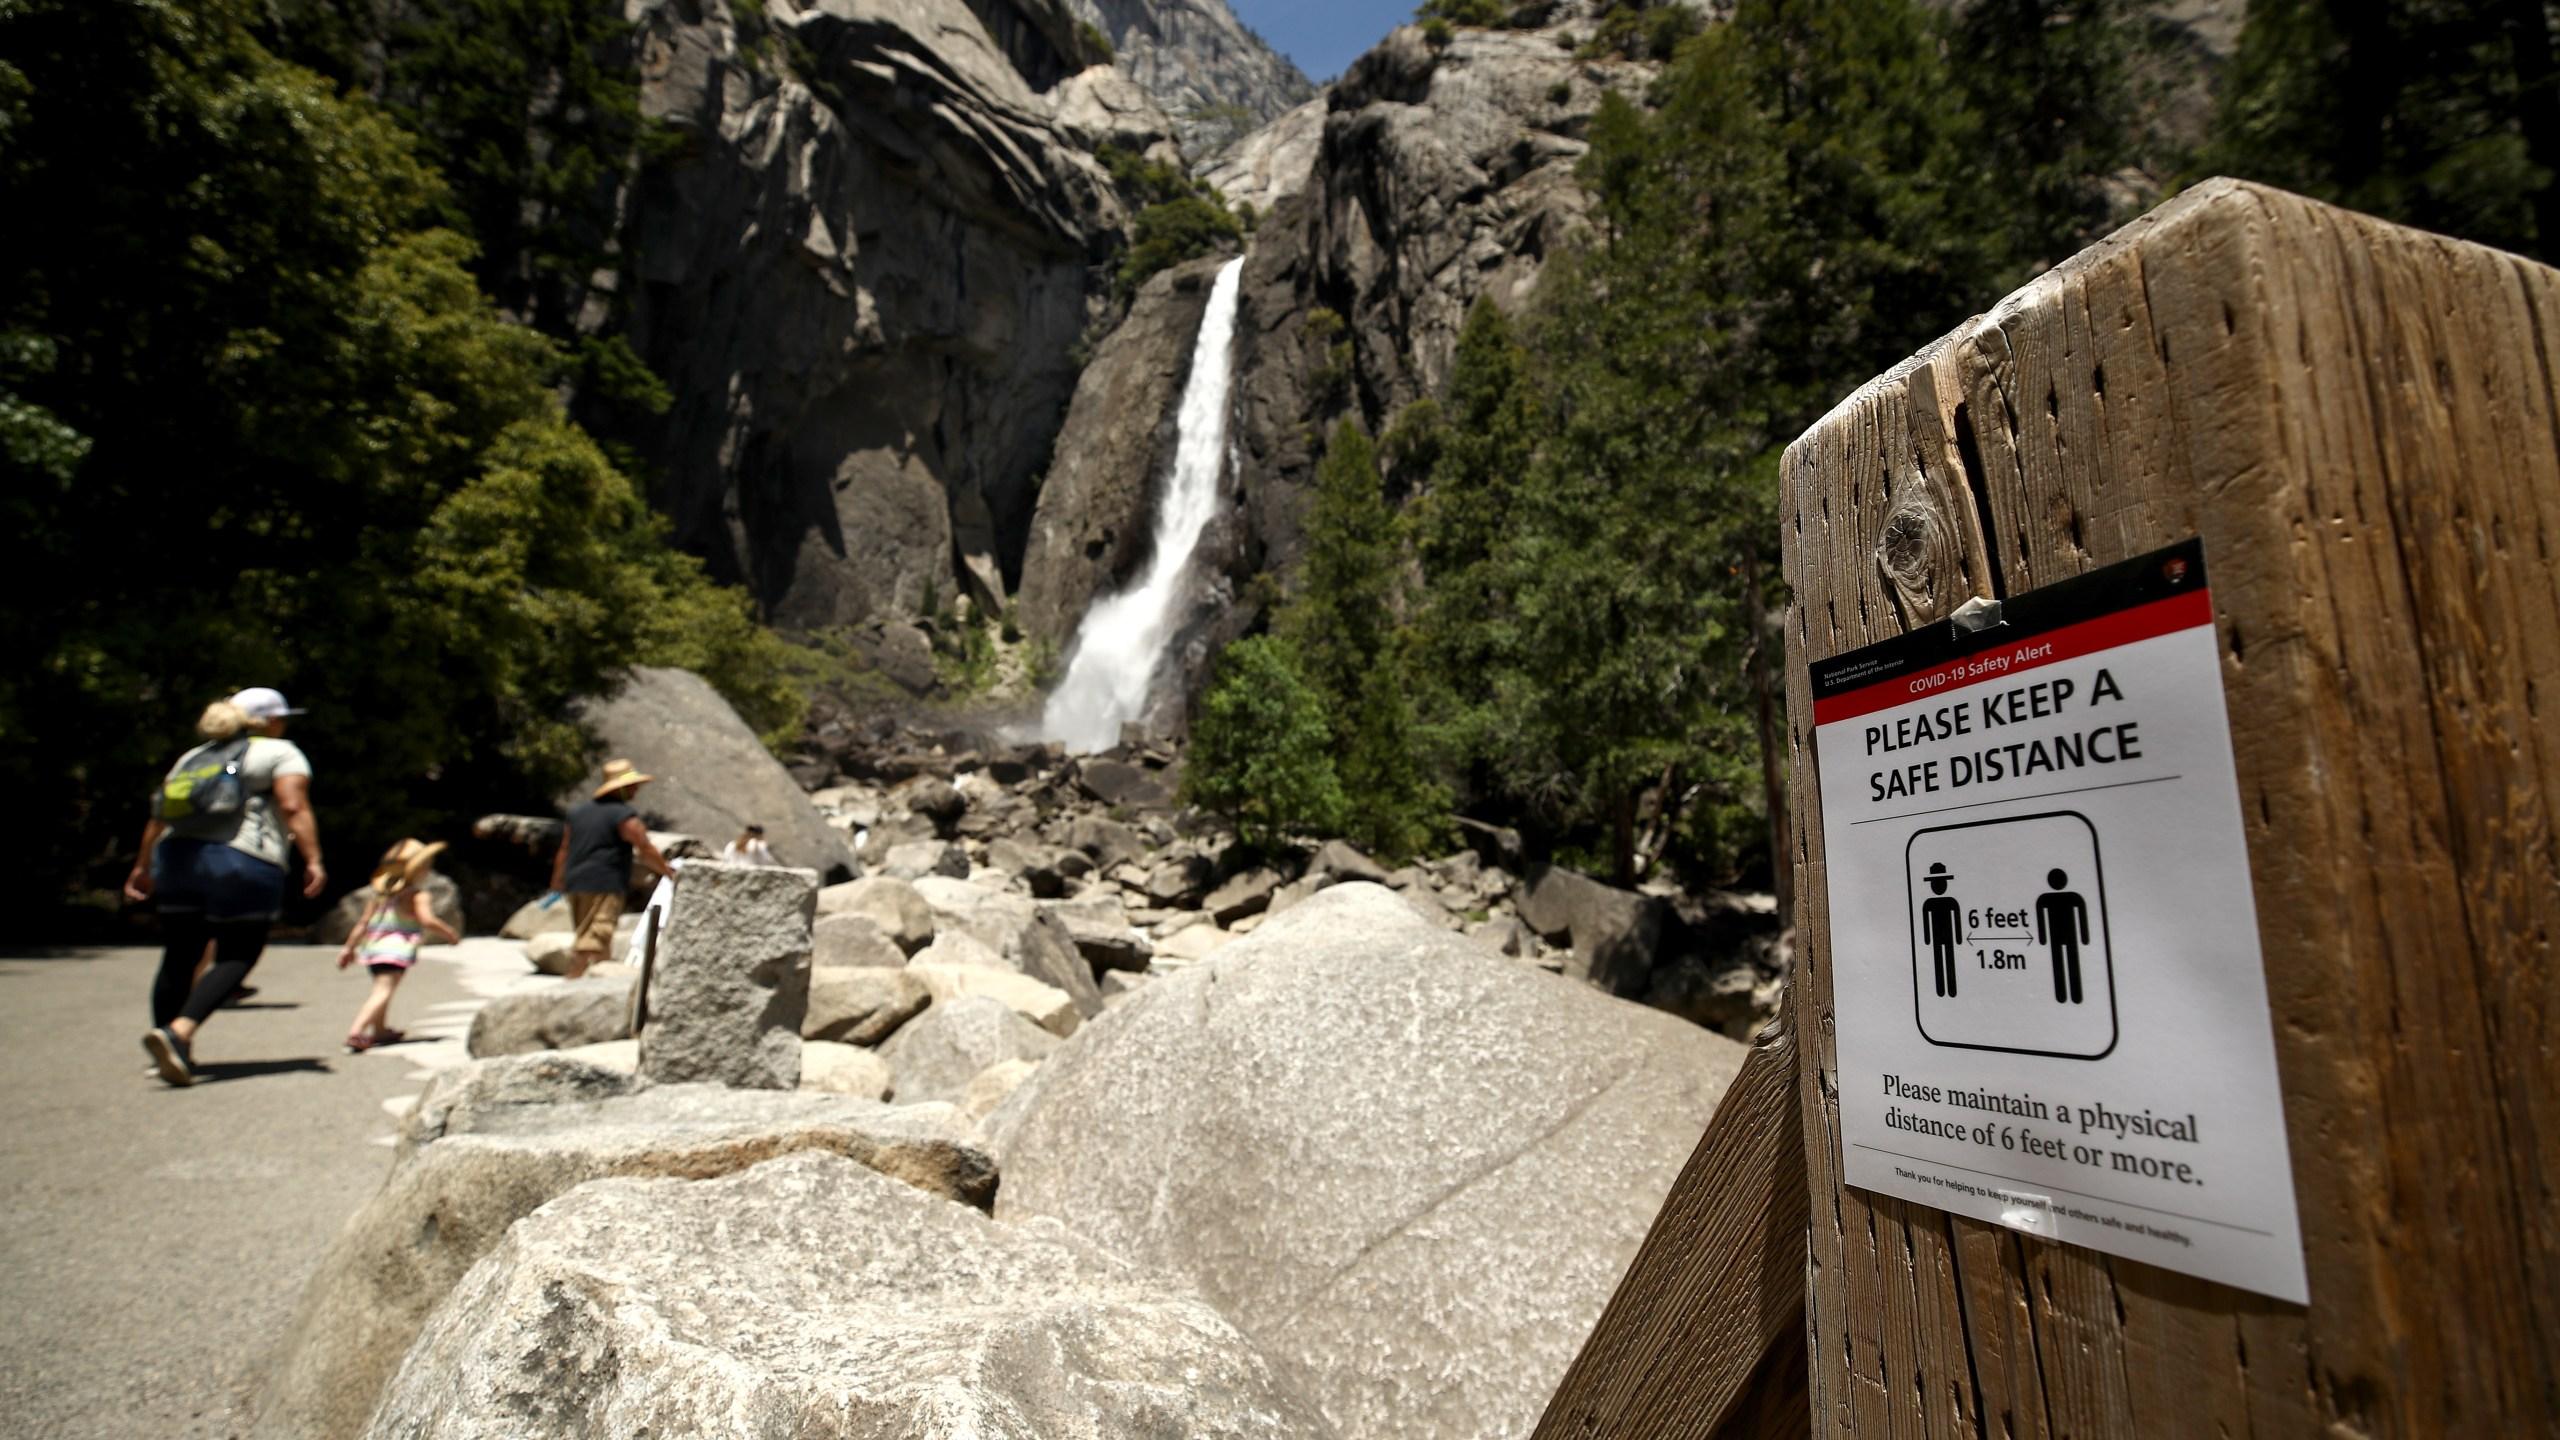 A sign explaining social distancing at Yosemite Falls on June 11, 2020 in Yosemite National Park. (Ezra Shaw/Getty Images)